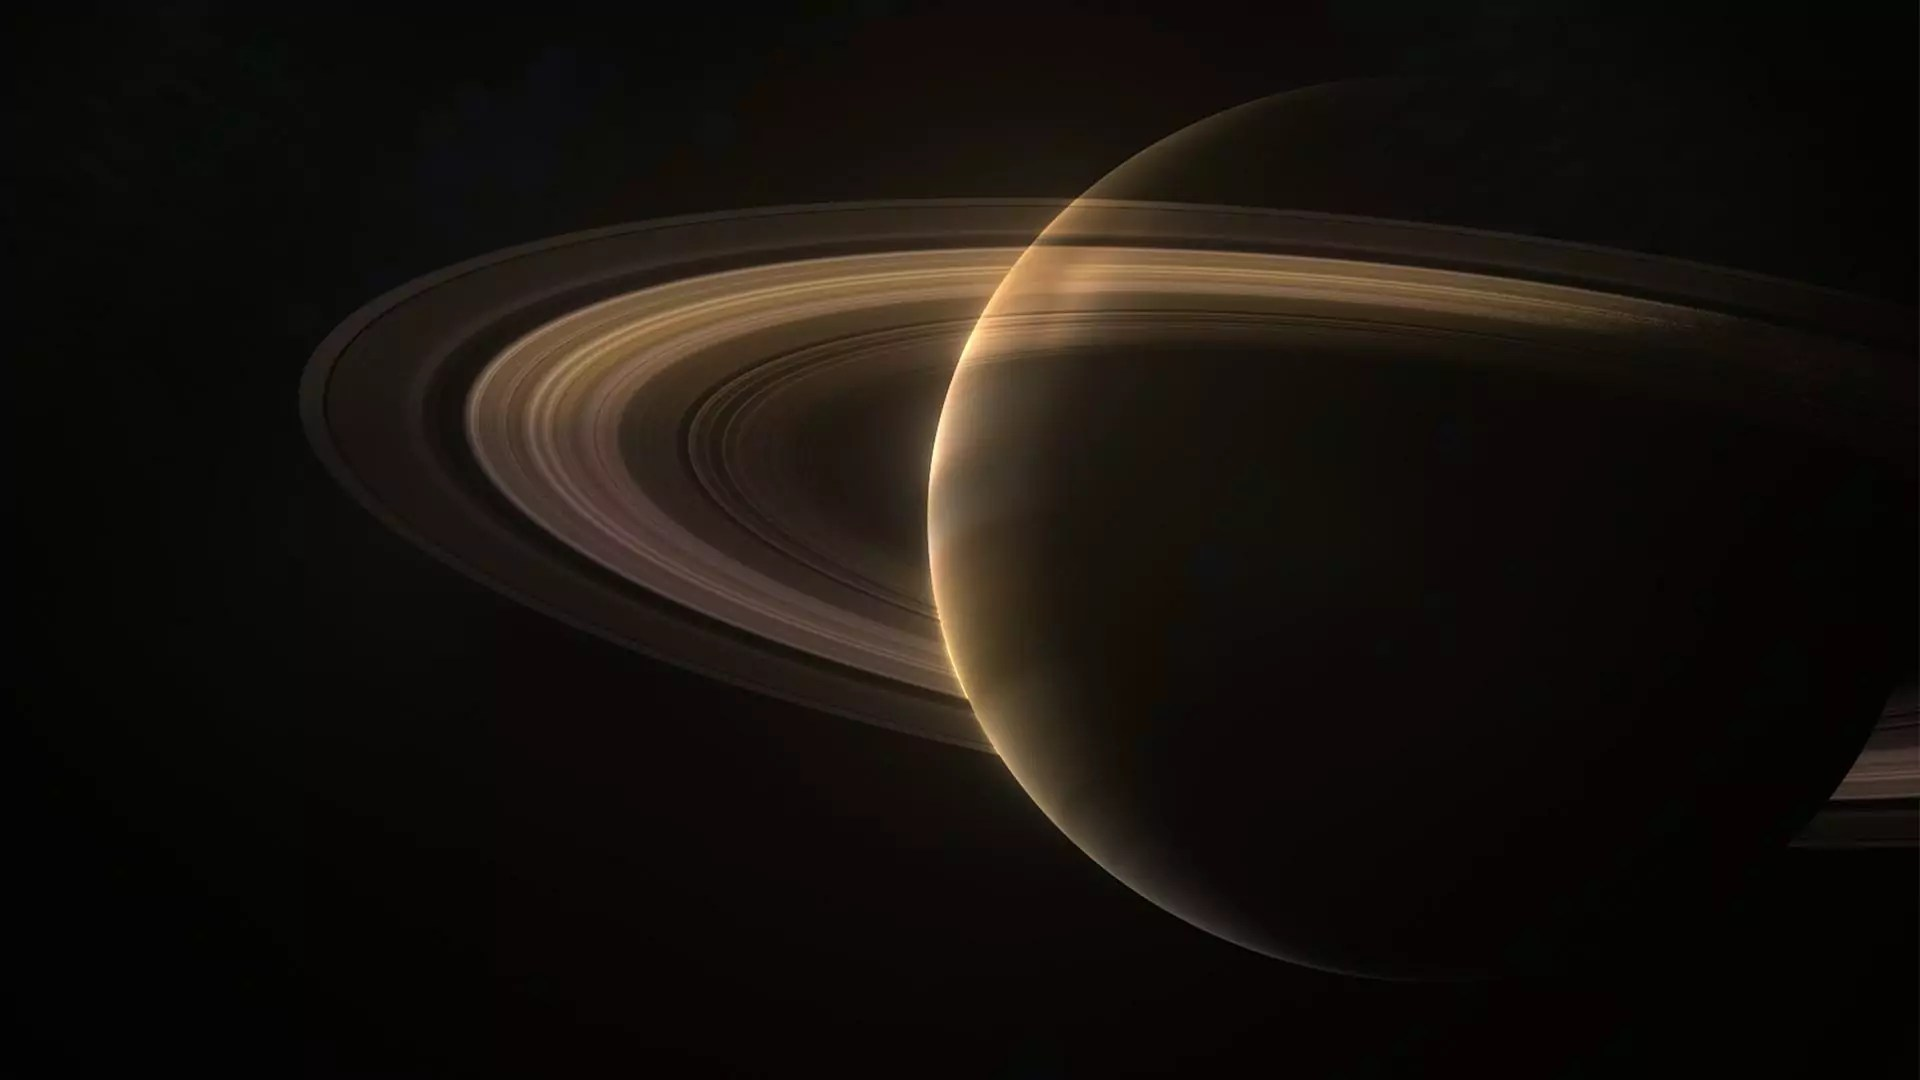 CG illustration of Saturn.